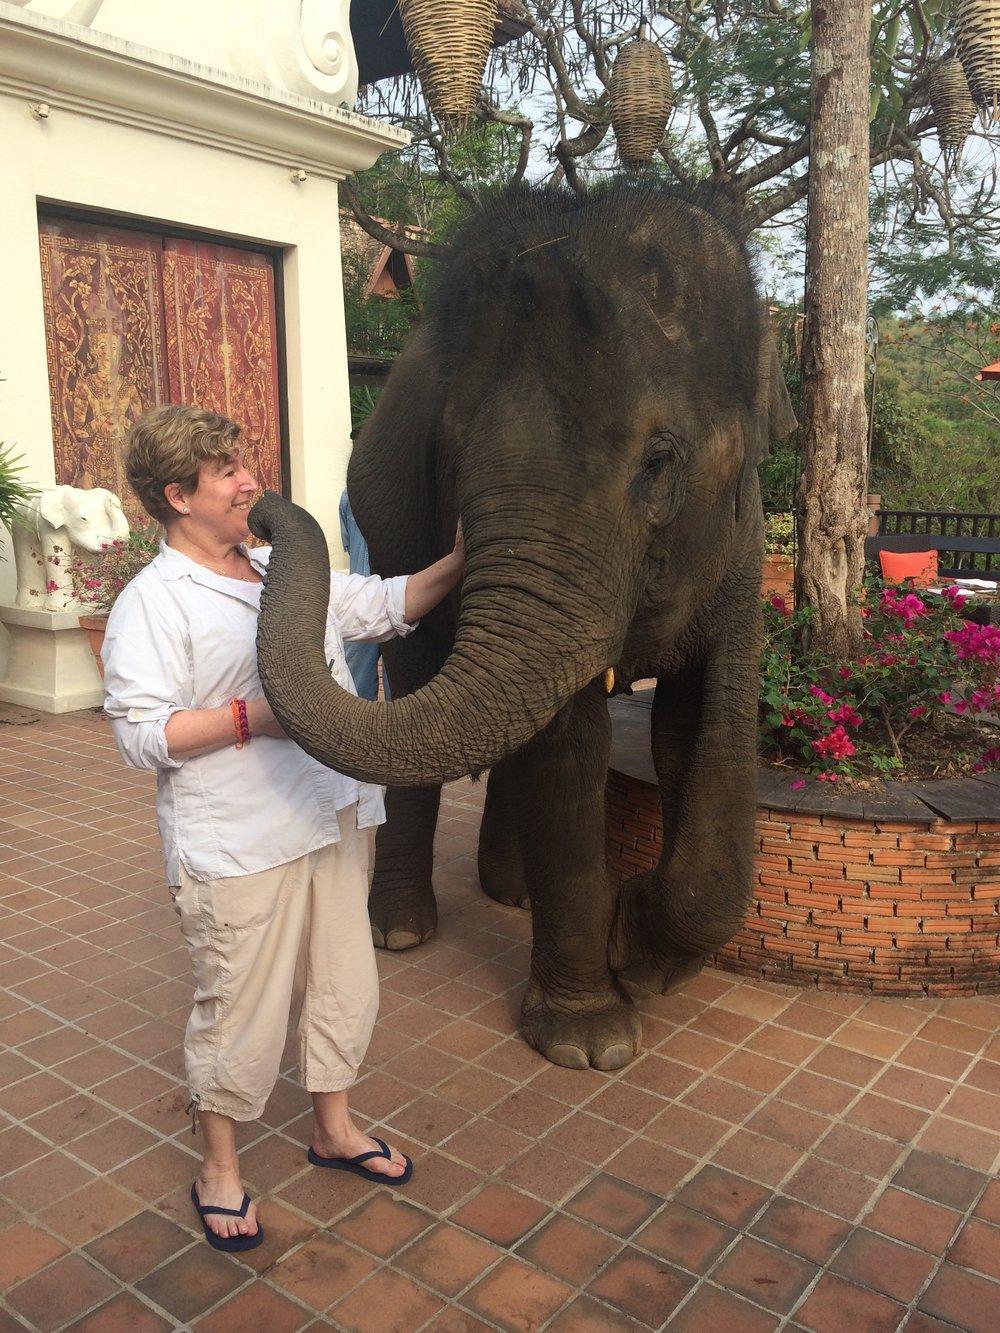 Breakfast with elephant